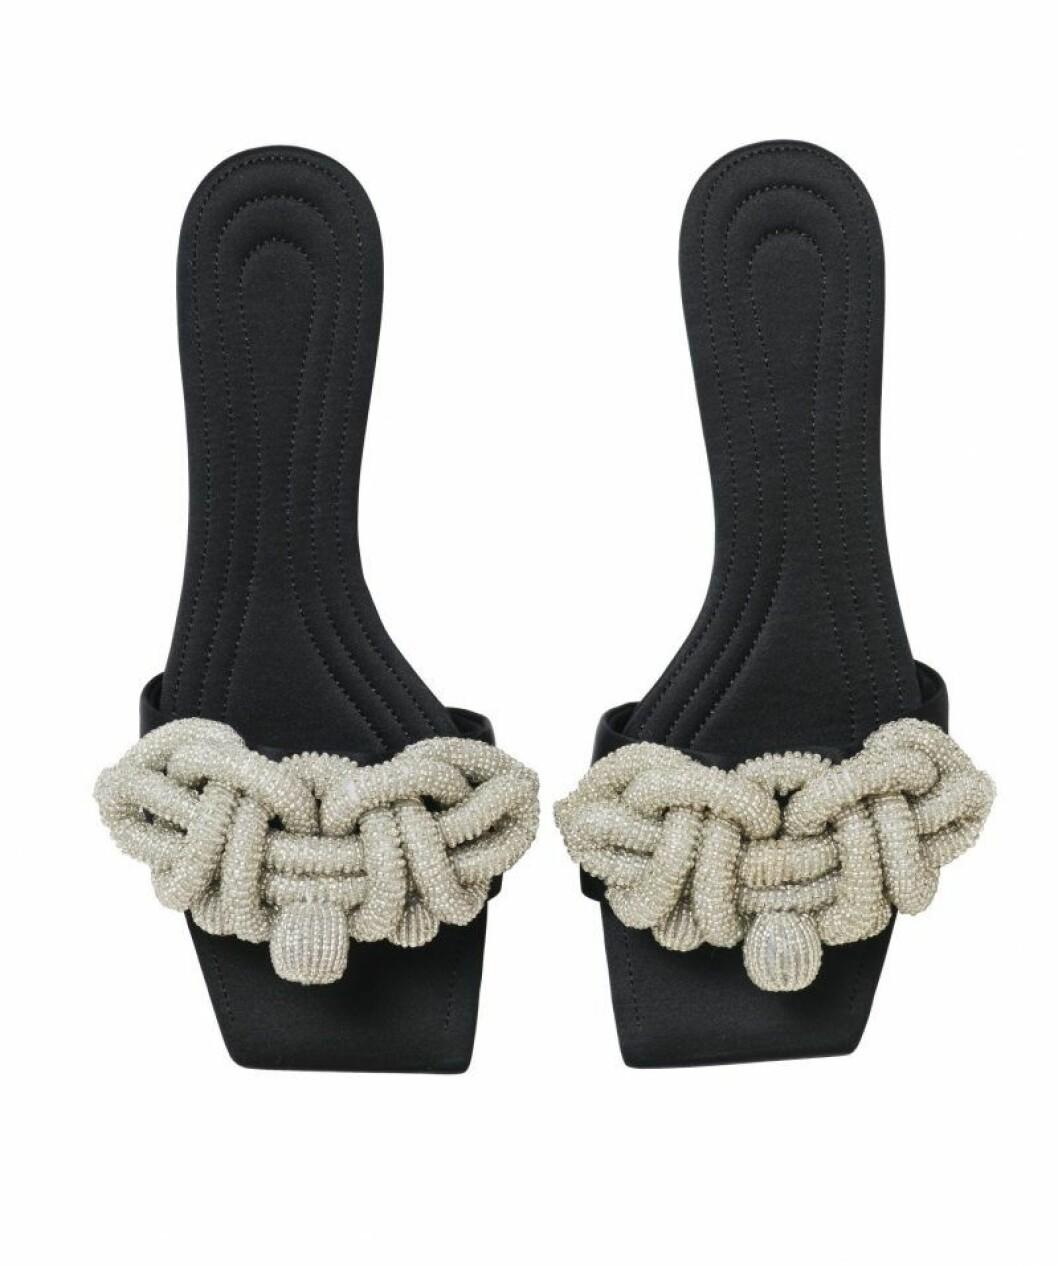 H&M Conscious Exclusive SS20 svarta sandaler